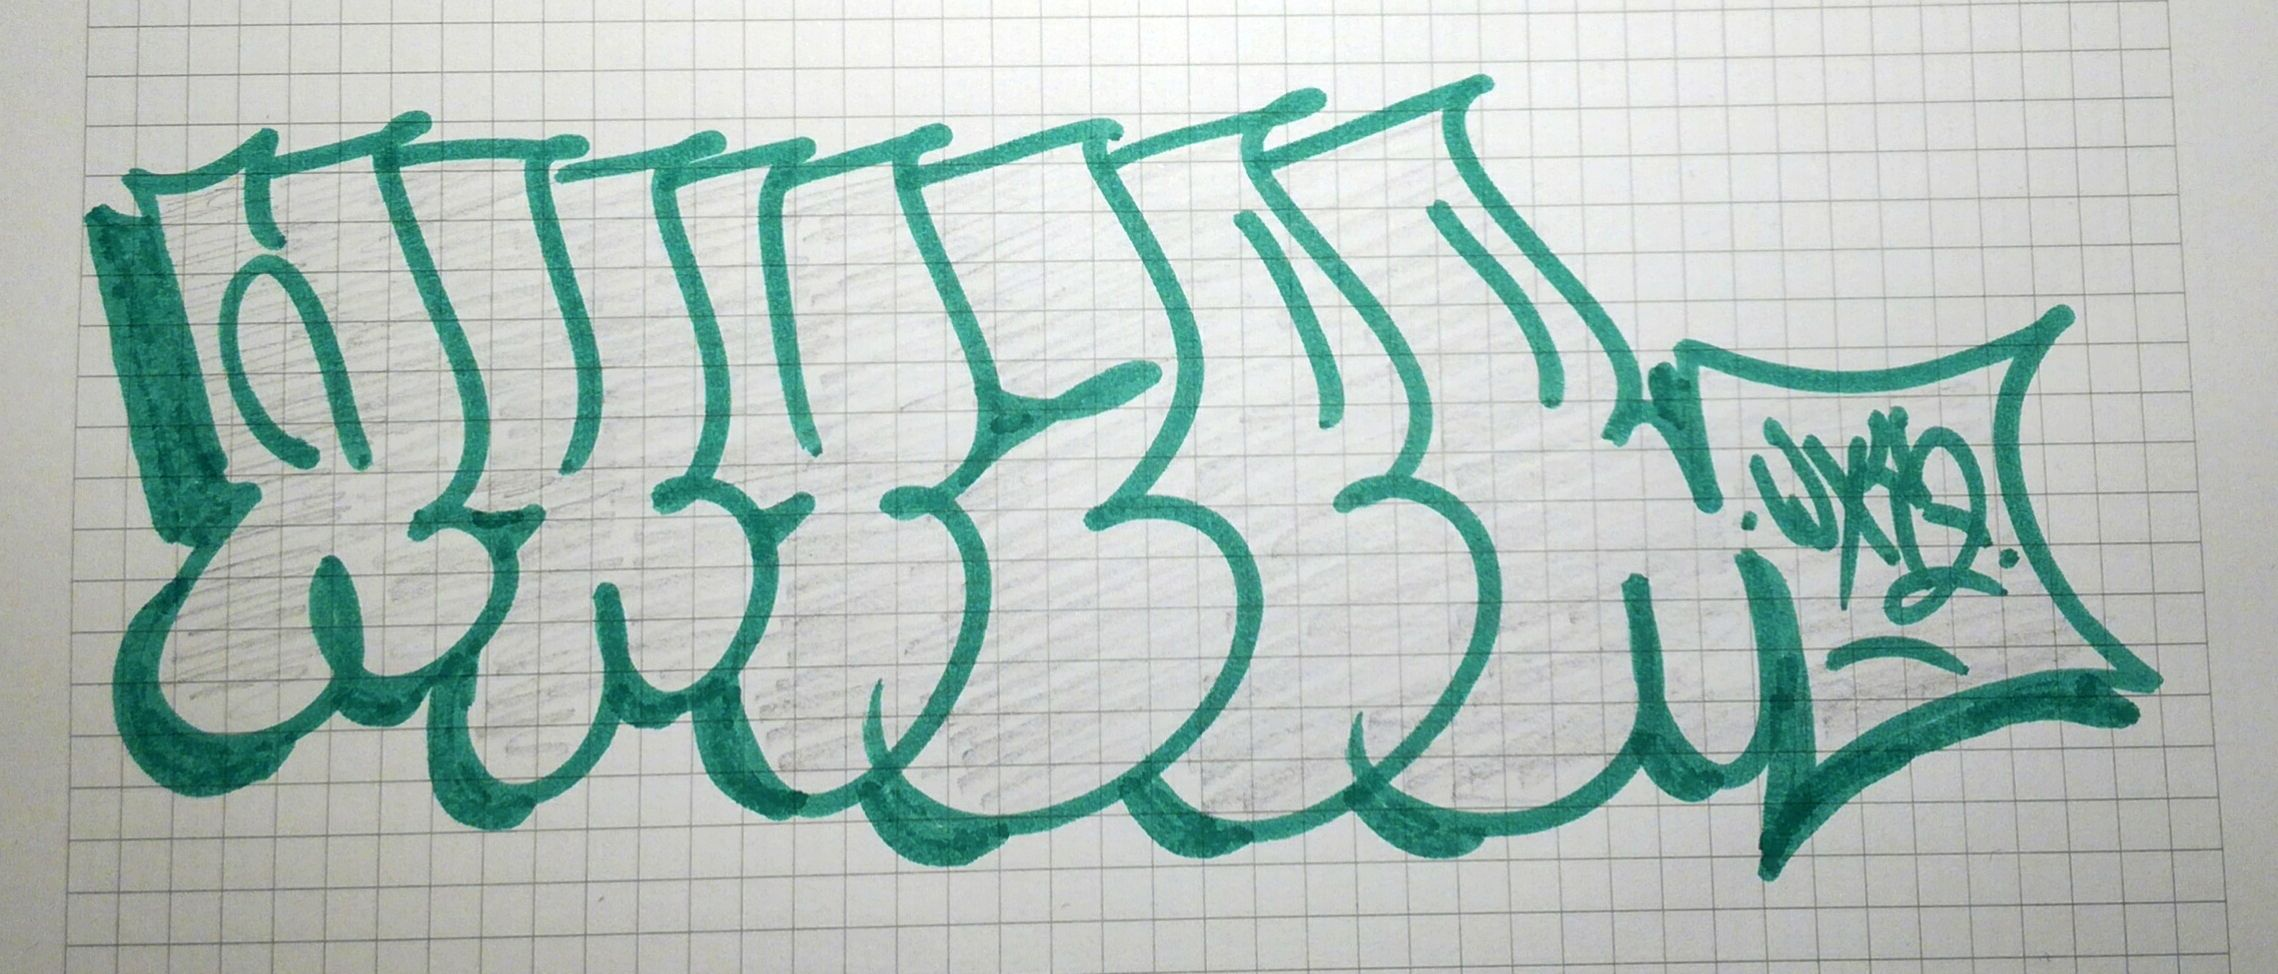 06_otrock.jpg